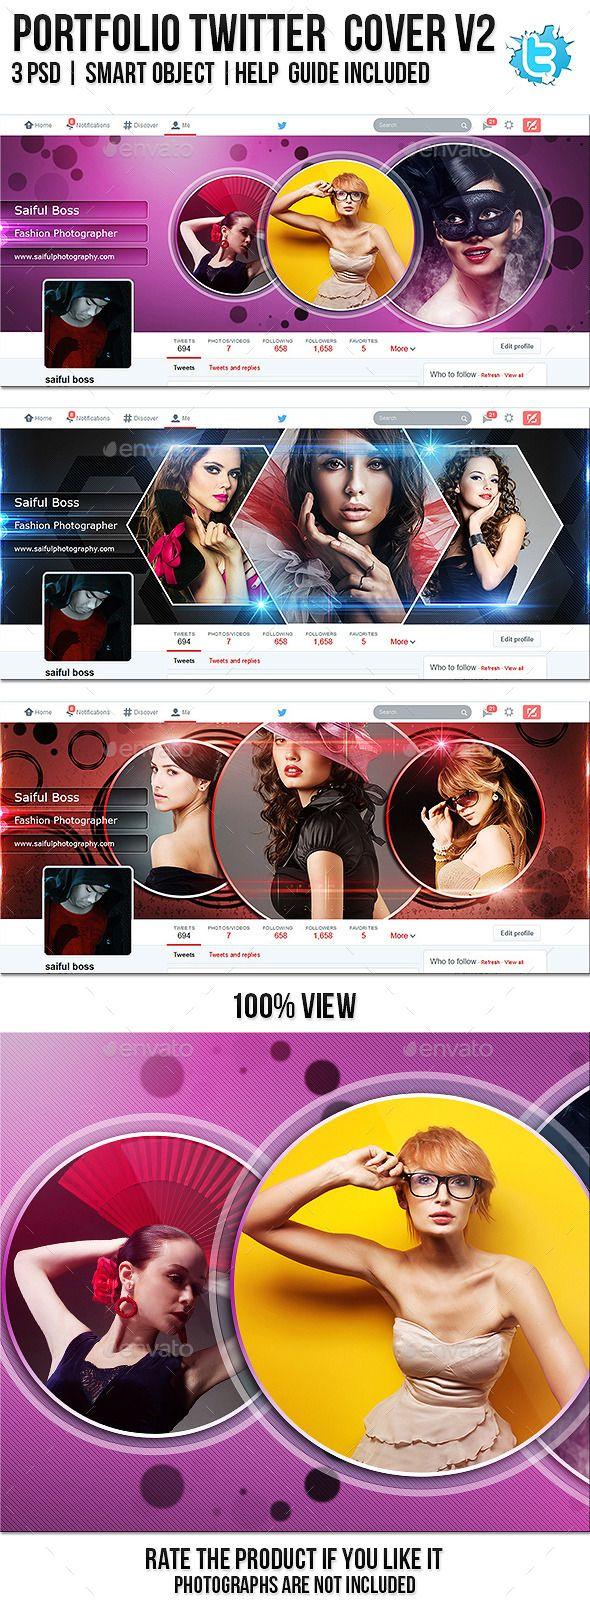 Portfolio Twitter Profile Cover V2